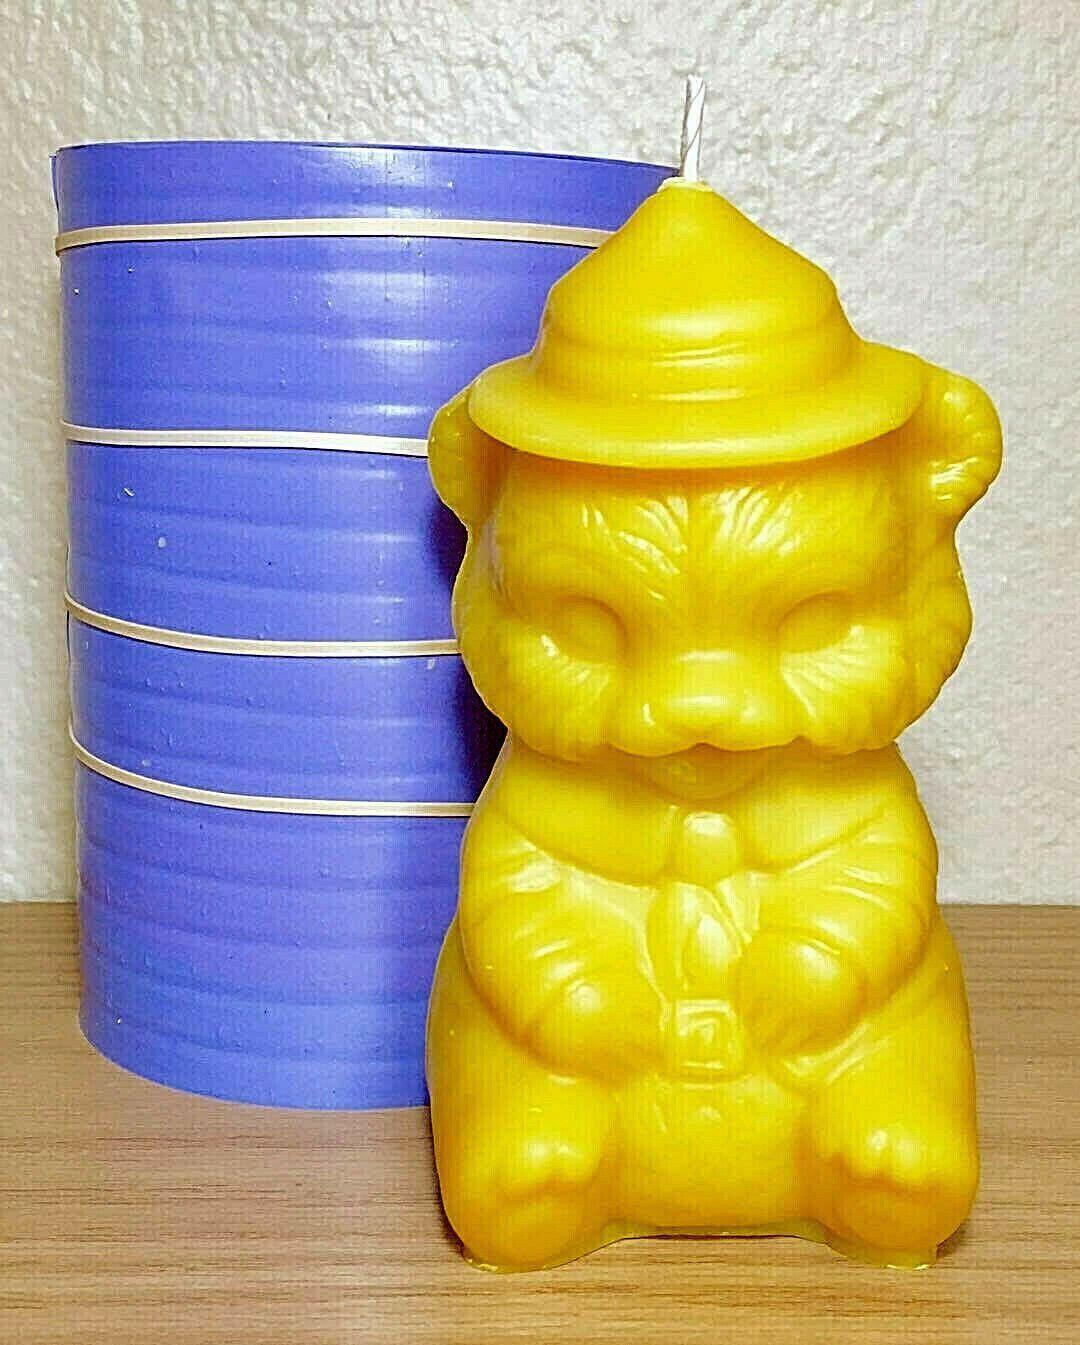 3d silicone teddy bear mold homemade candle mold soap